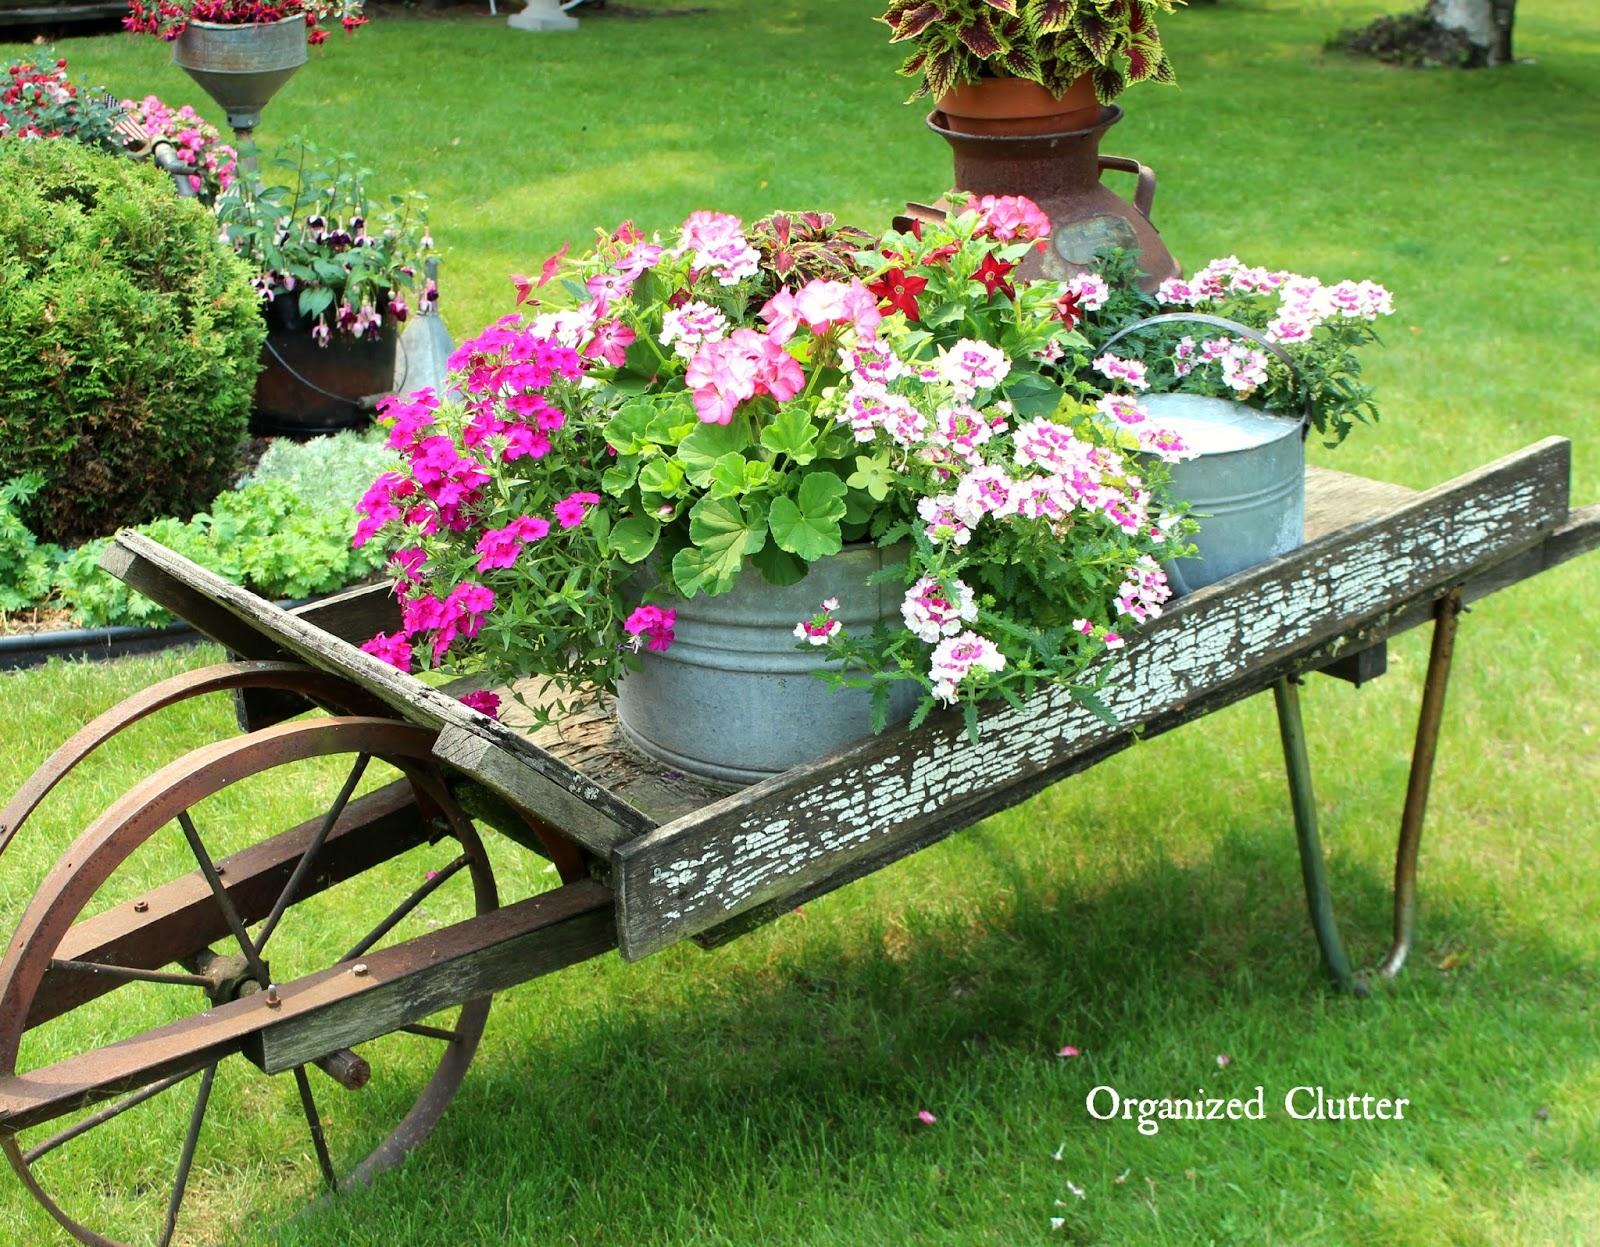 Rustic Garden Wheelbarrow 2015   Organized Clutter on Rustic Backyard Ideas id=13275